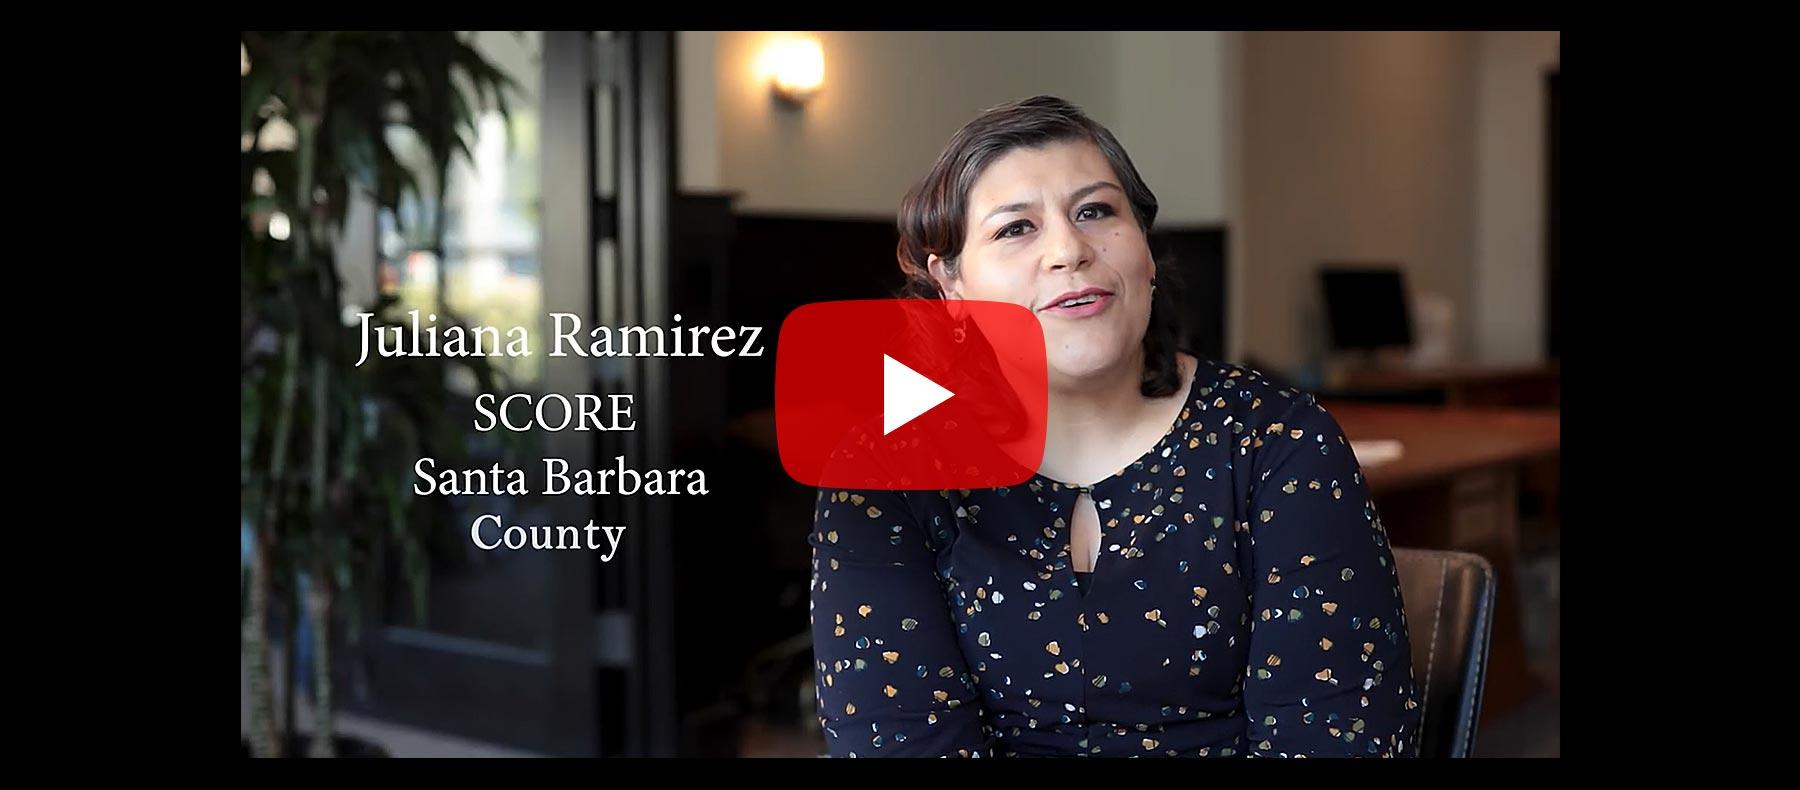 seminarios de web para negocios afectados por COVID -- SCORE Santa Barbara